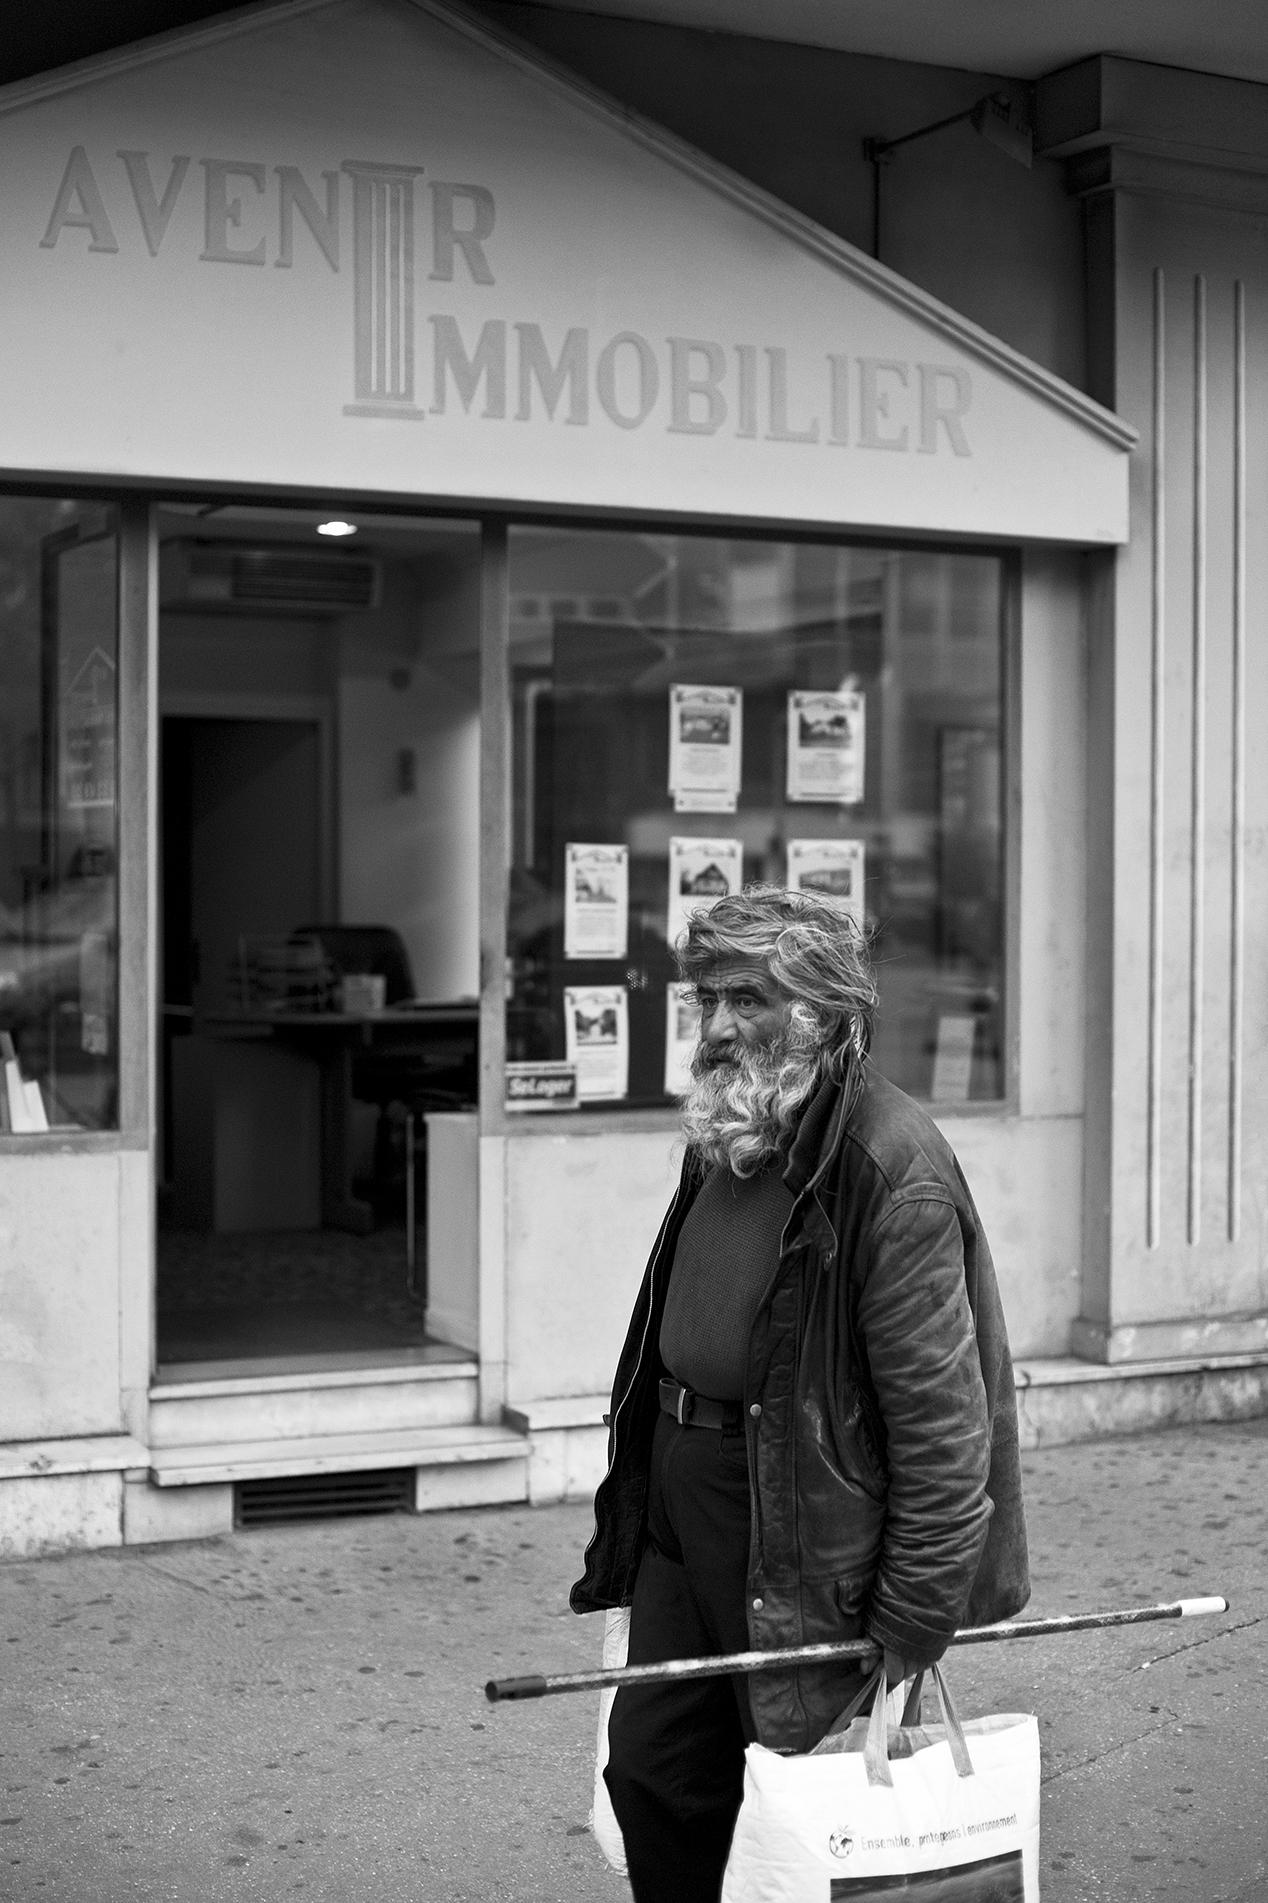 avenir-immobilier-Chambéry-juin-2011.jpg